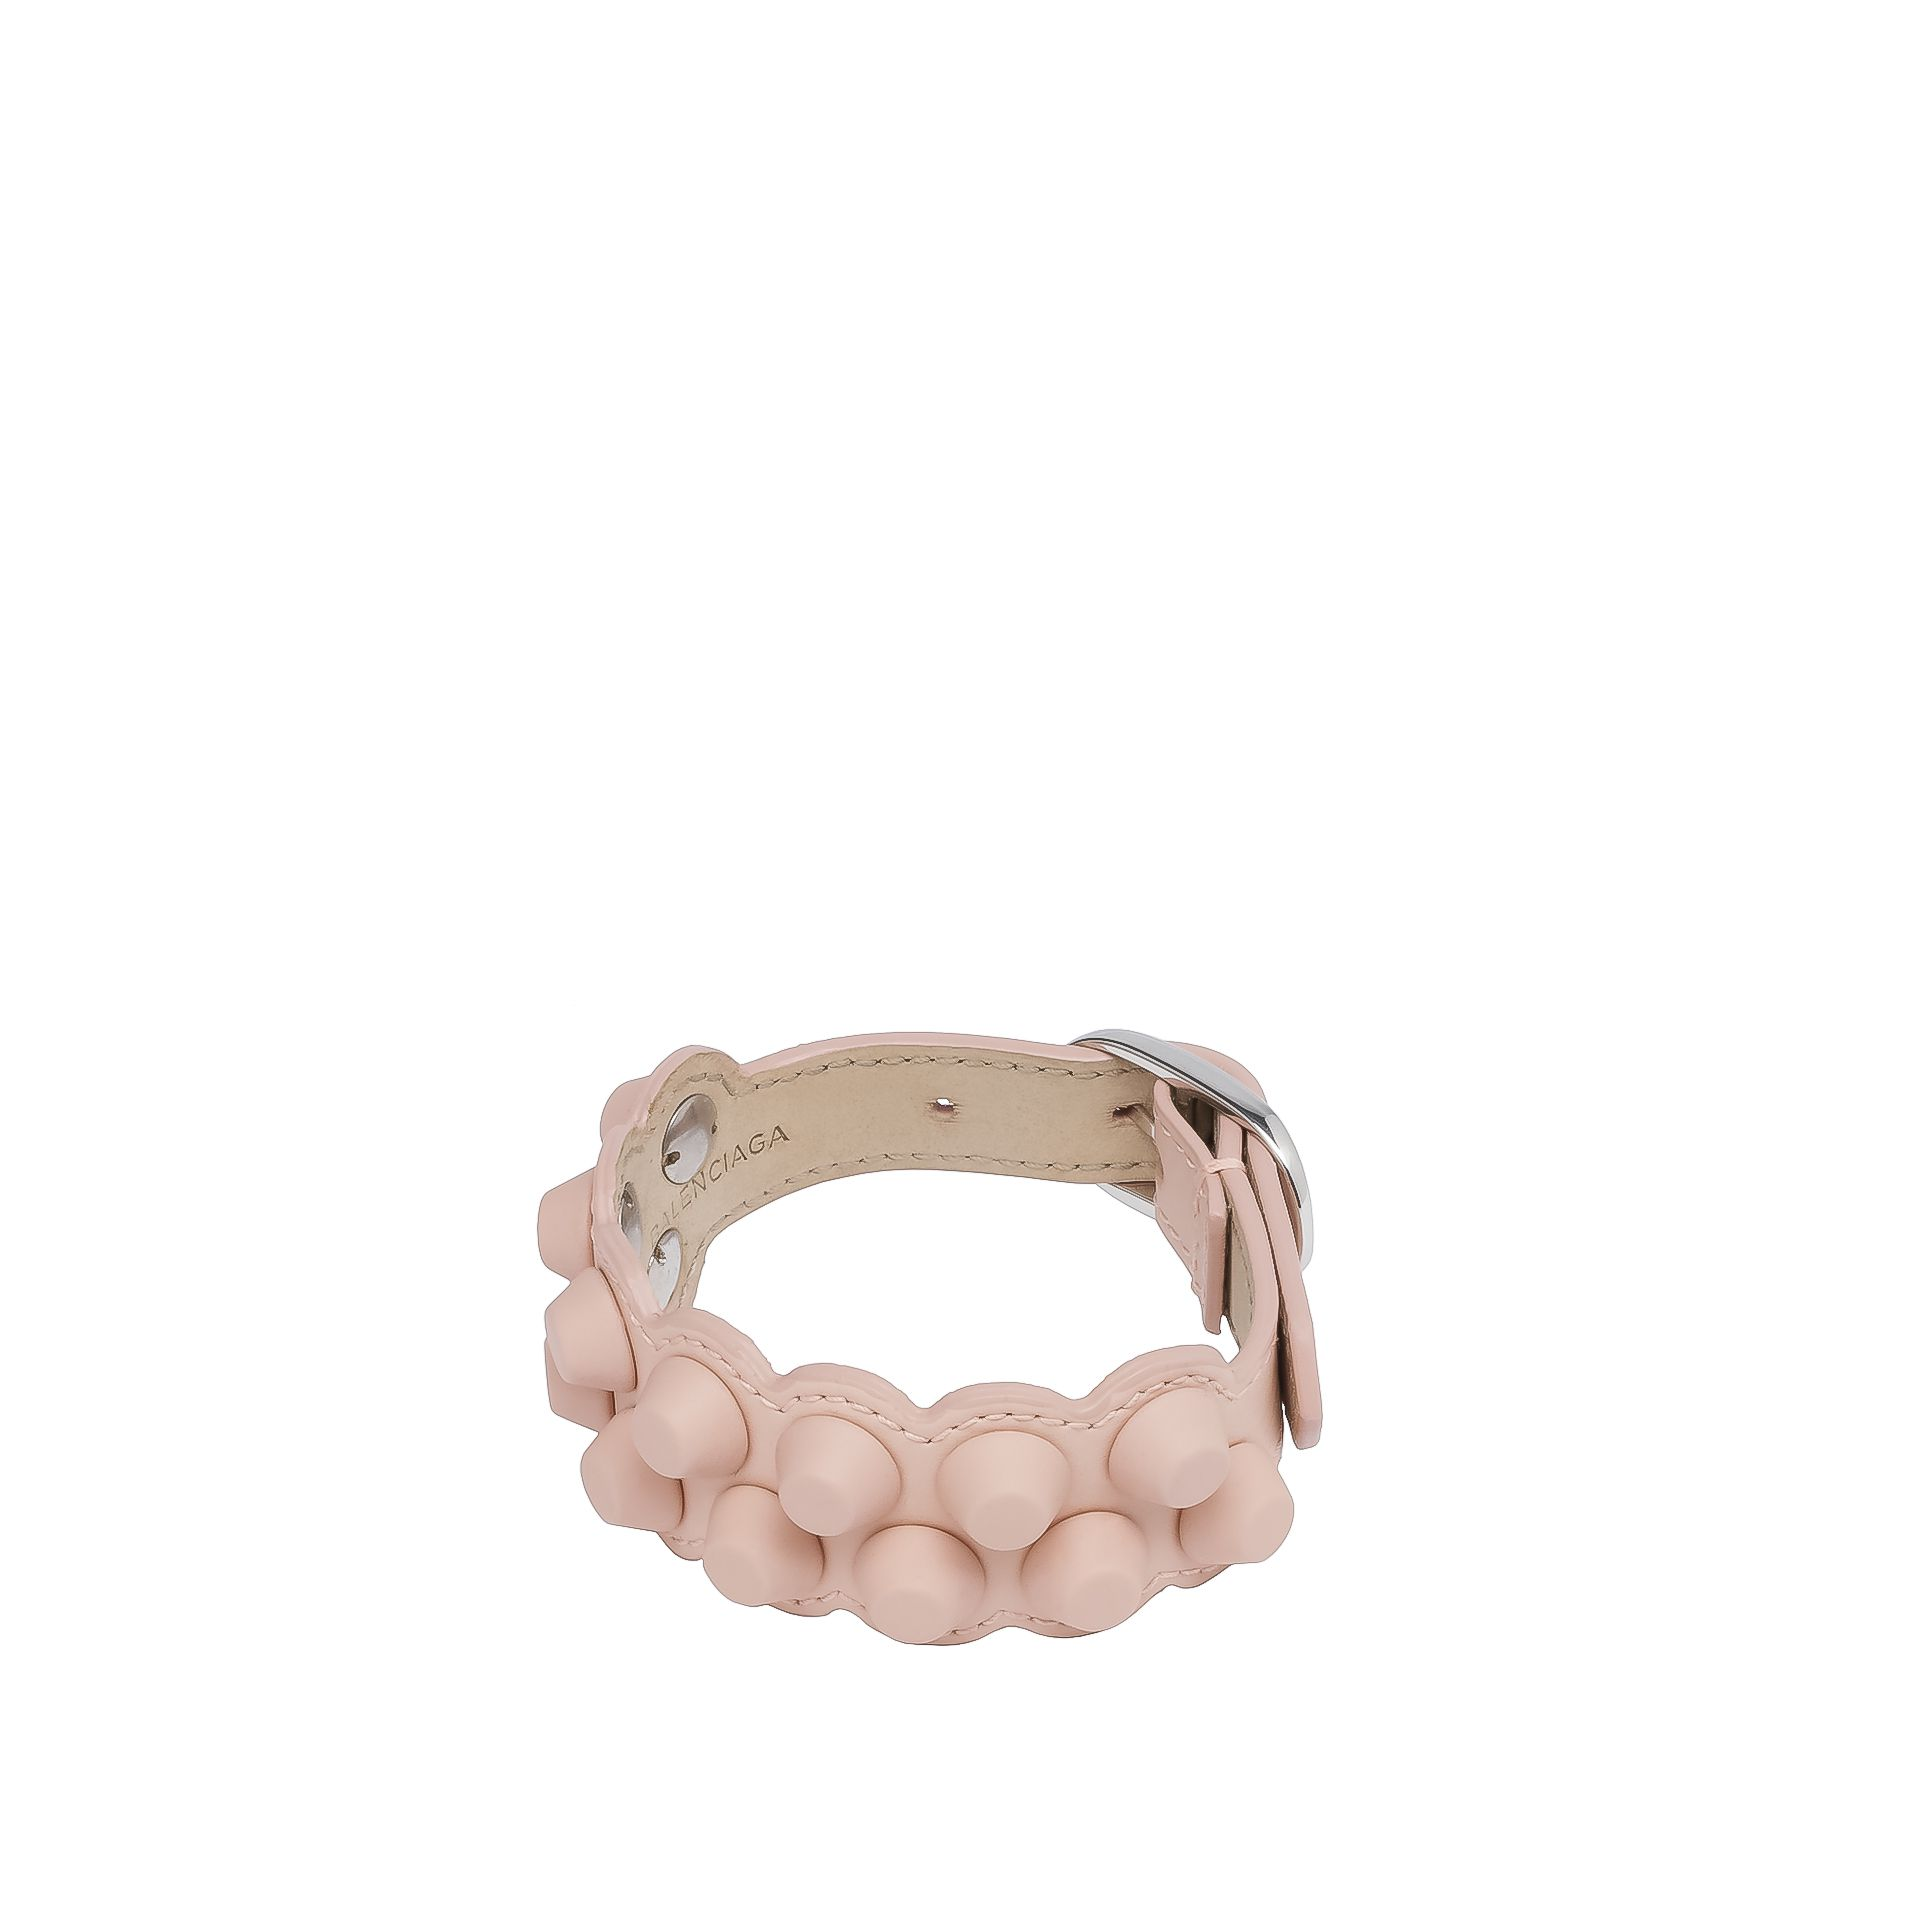 BALENCIAGA Balenciaga Classic Bracelet Studs M Bracelet D f